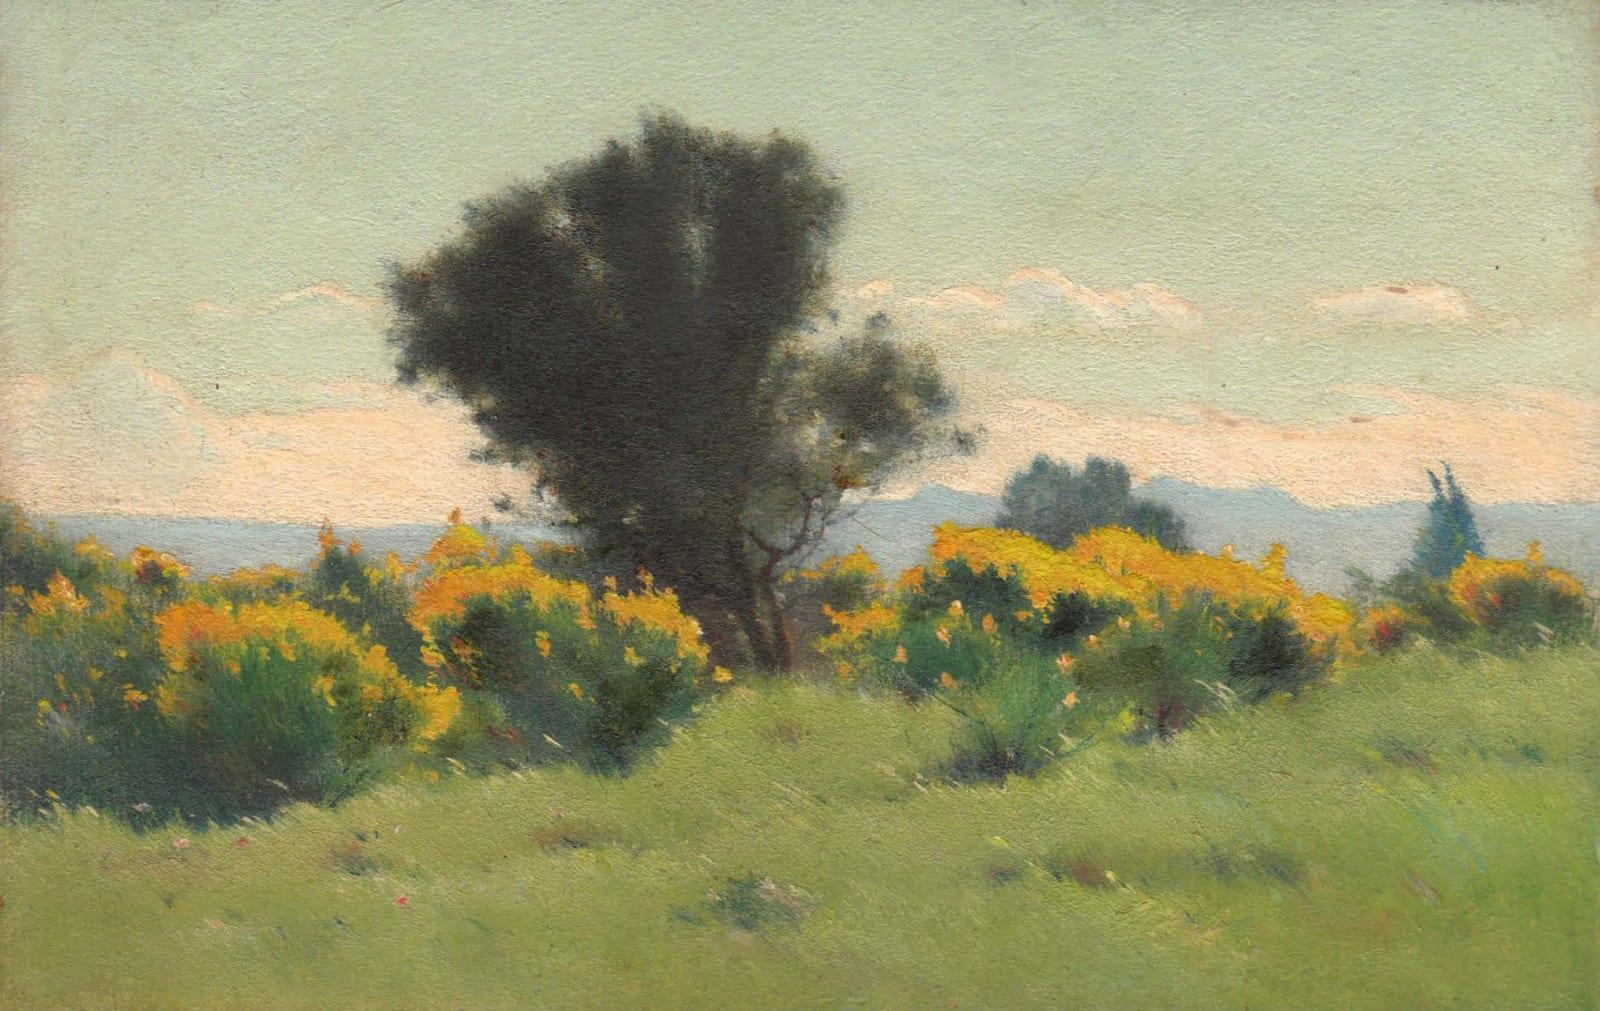 EDOUARD ATHÉNOSY, Brooms with olive tree, 1925